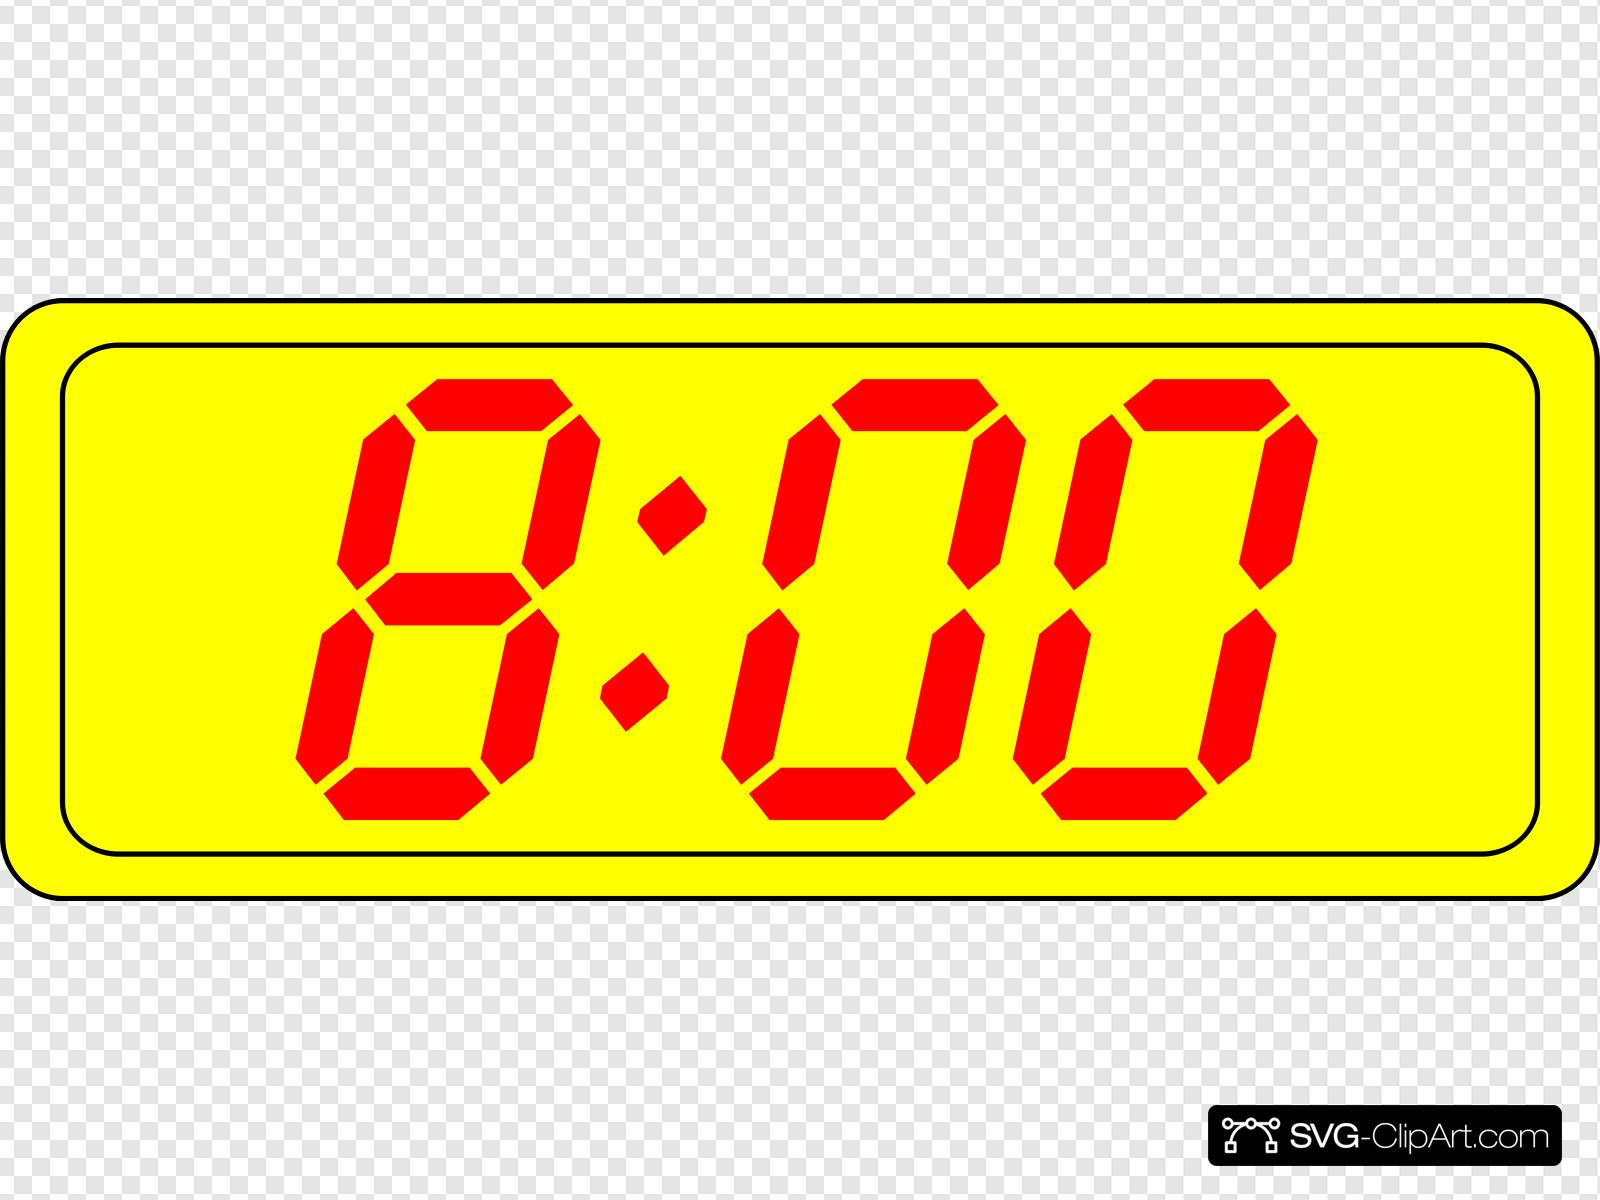 Digital Clock 8:00 Clip art, Icon and SVG.